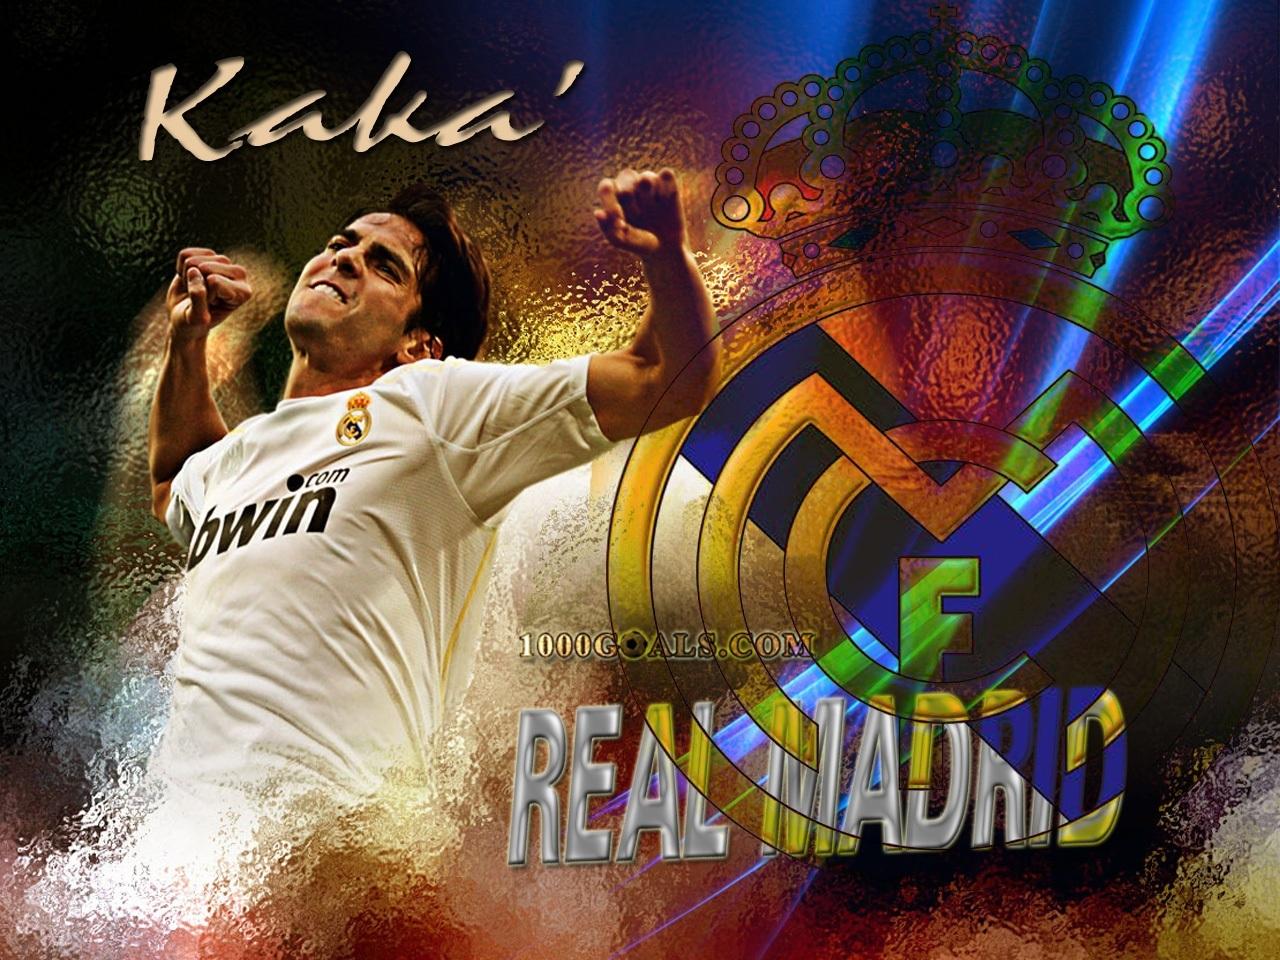 Cool Kaka Real Madrid Wallpaper Download Best Latest Hd 1280x960